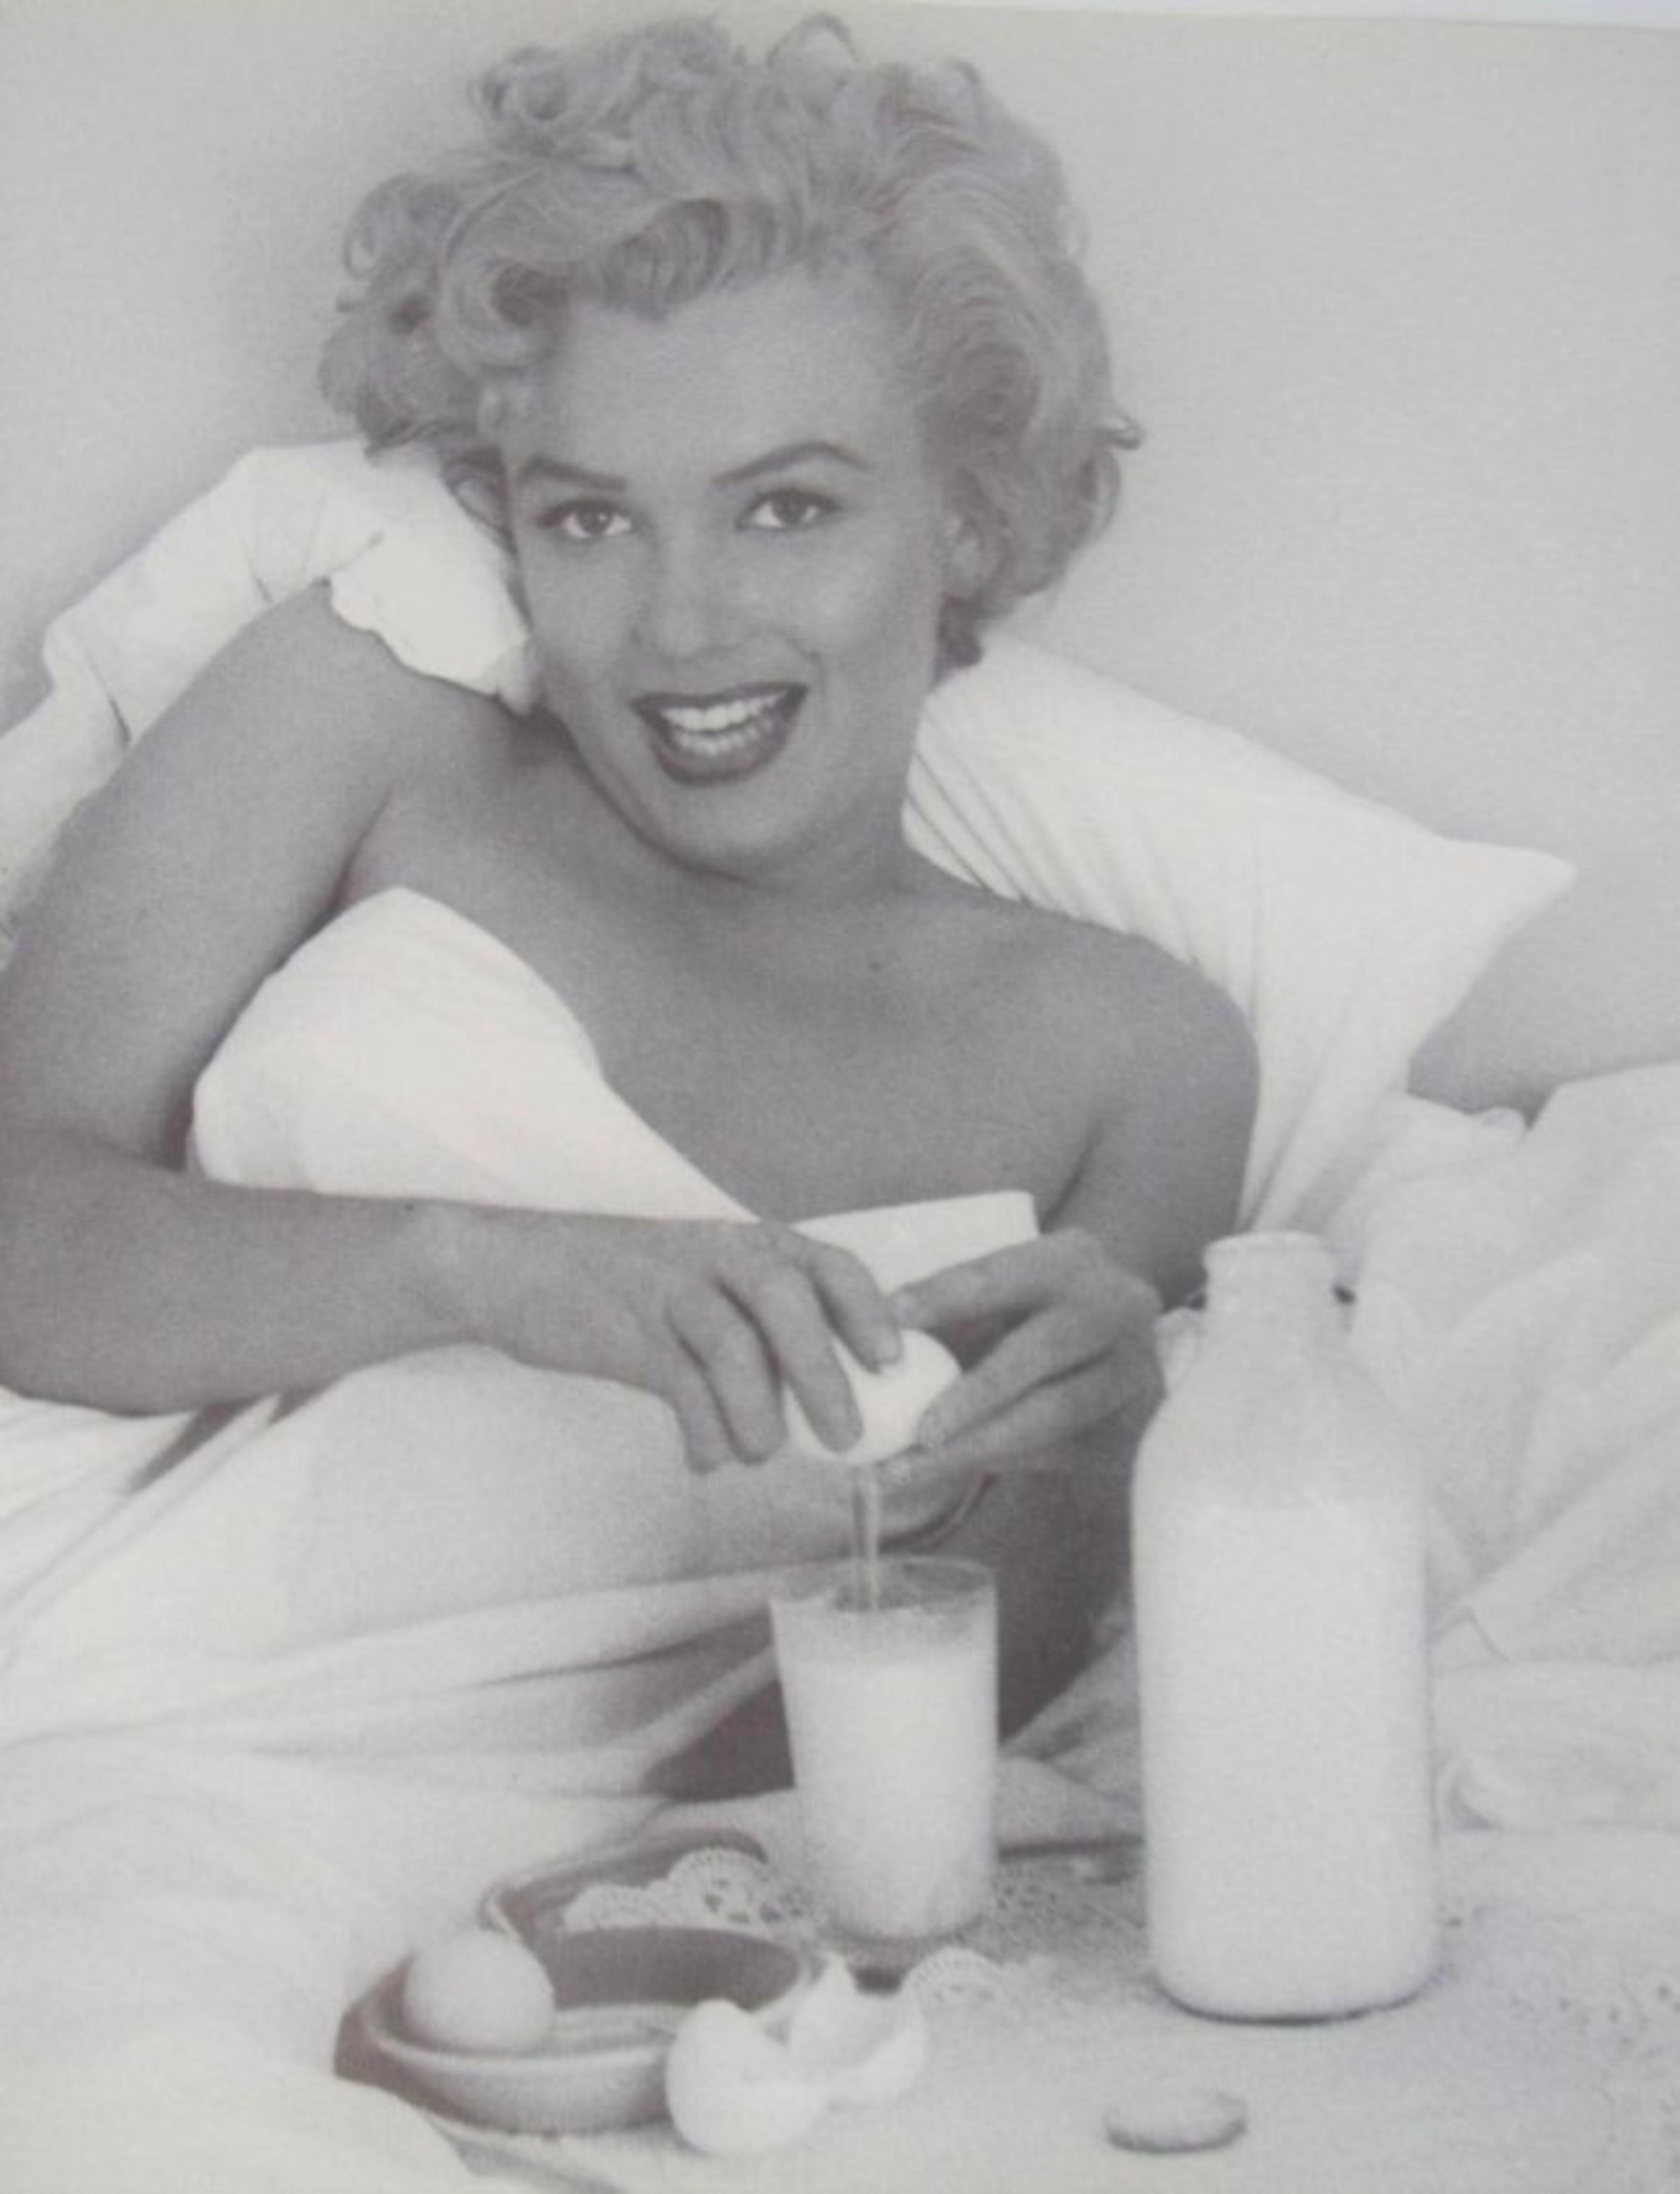 Pin on Bert Stern - Marilyn Monroe